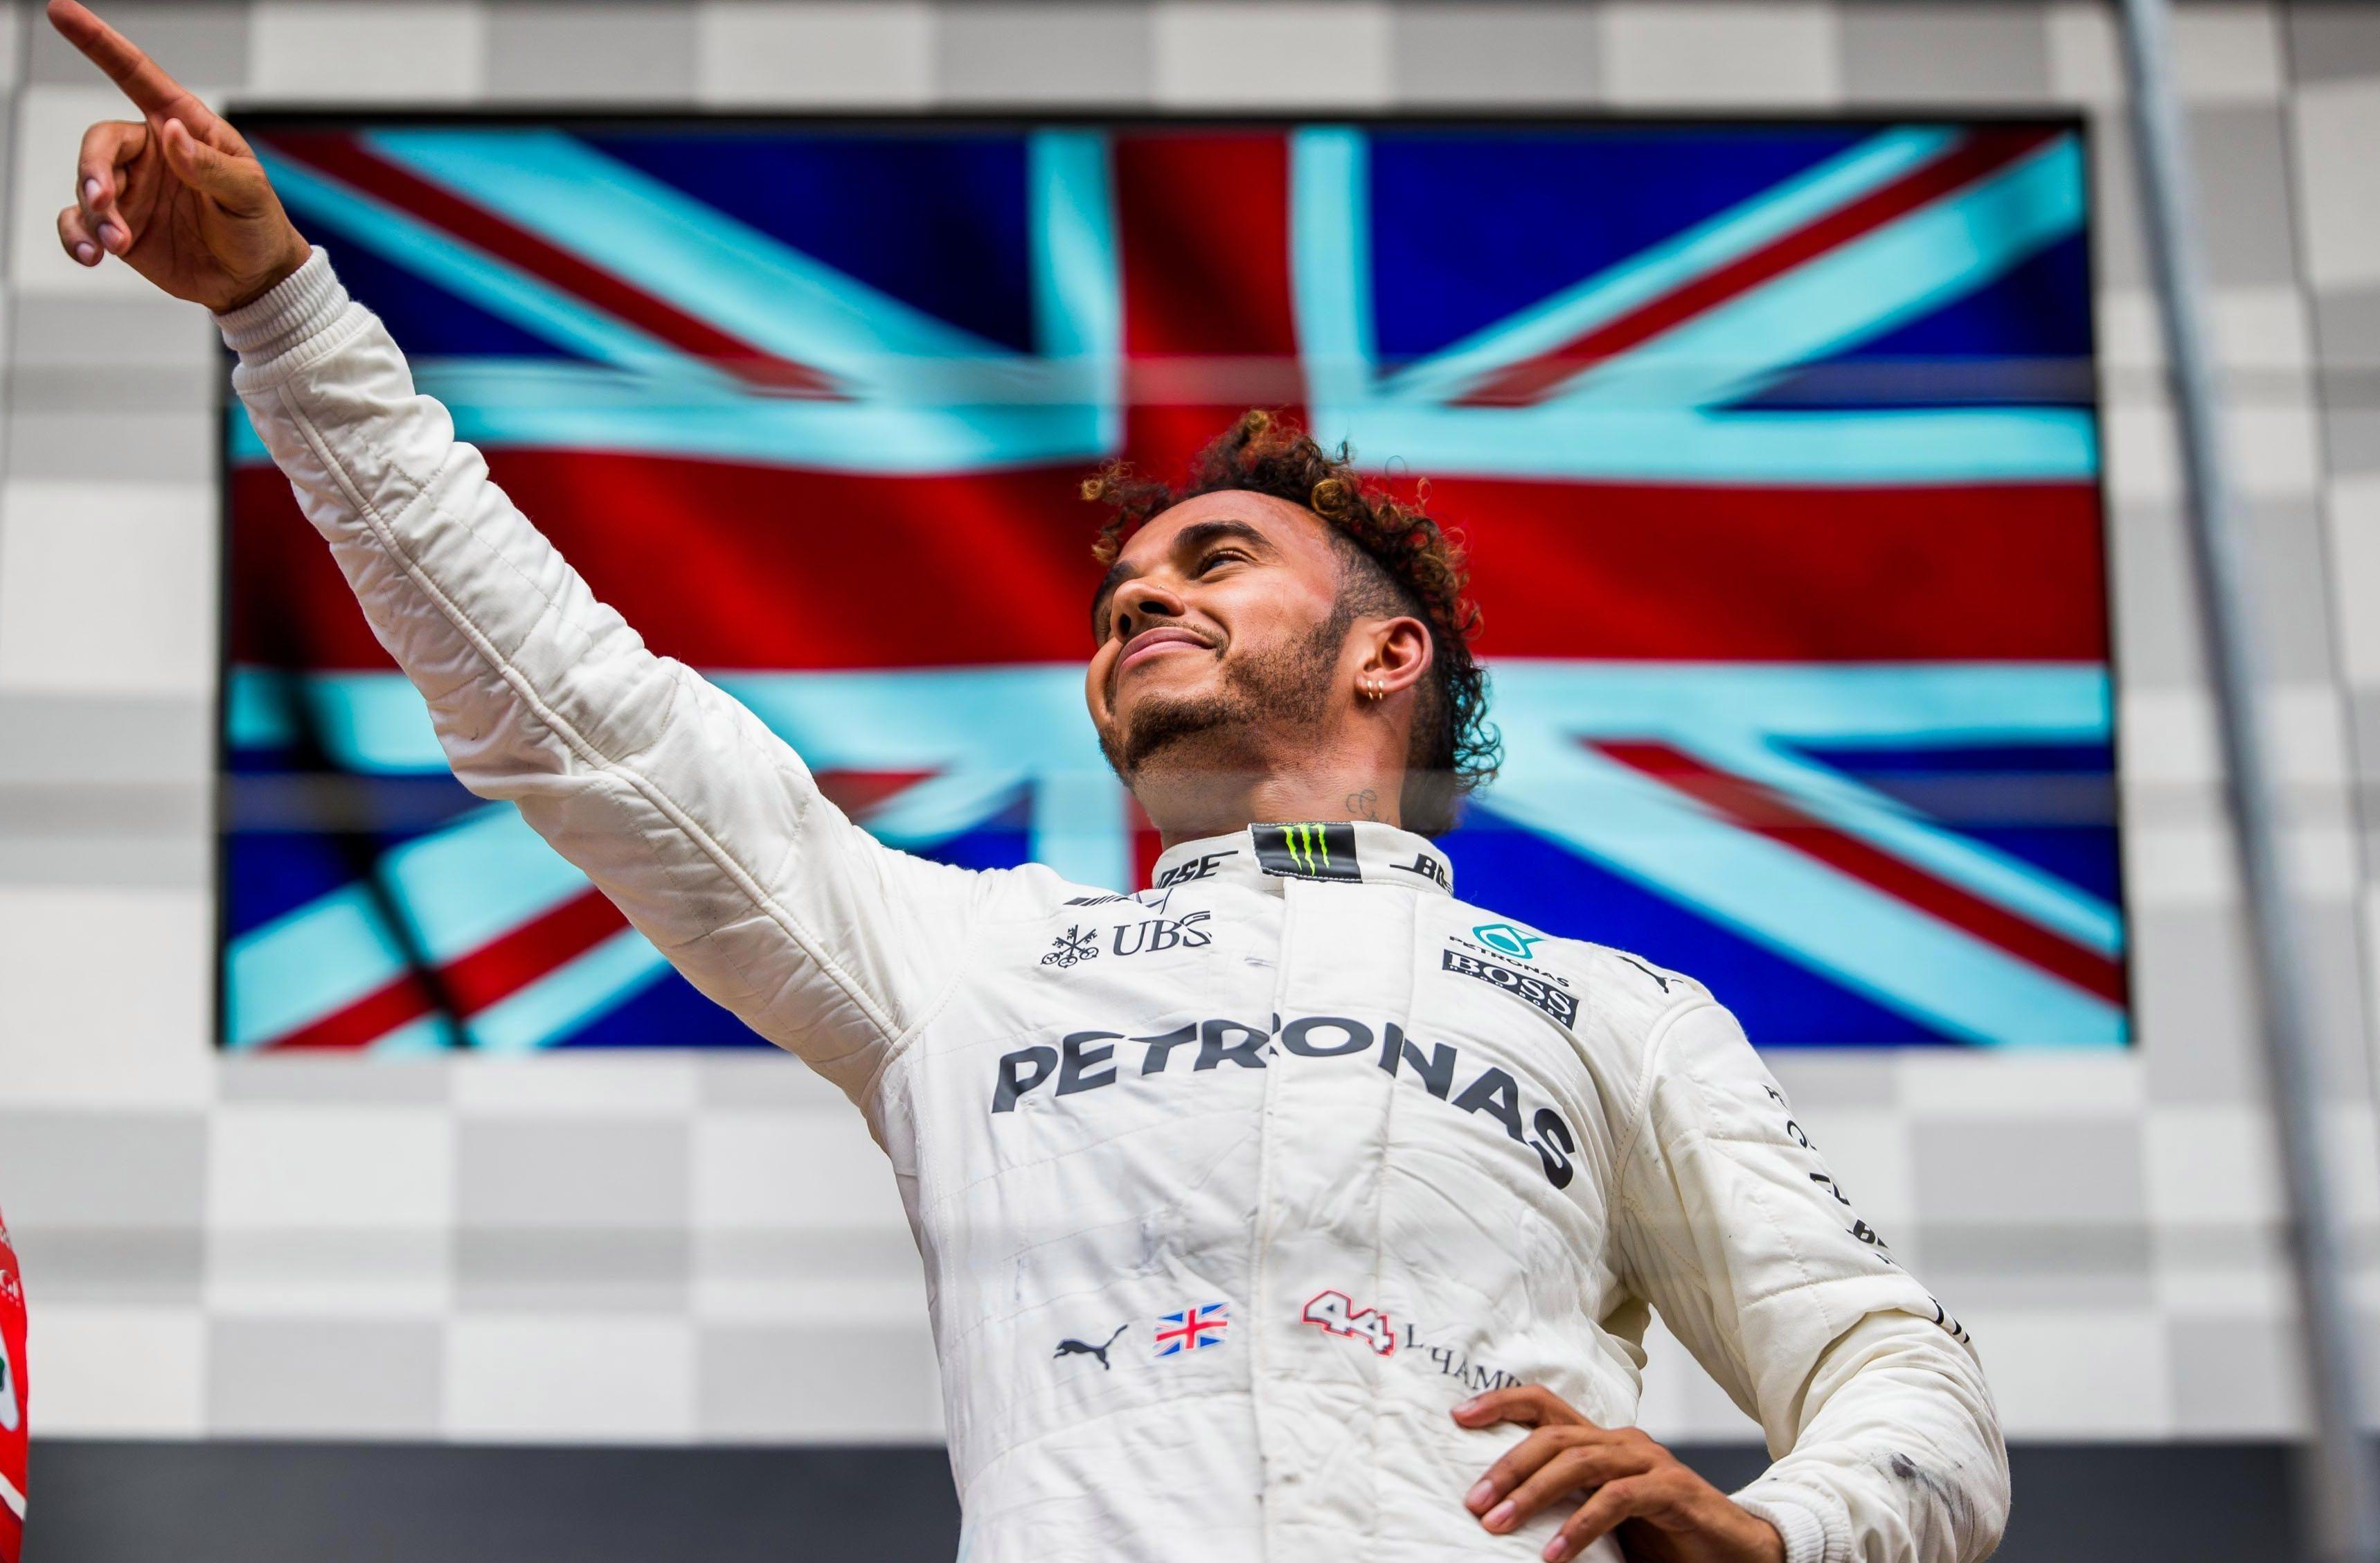 Lewis Hamilton beat Sebastian Vettel at the Belgian Grand Prix last year